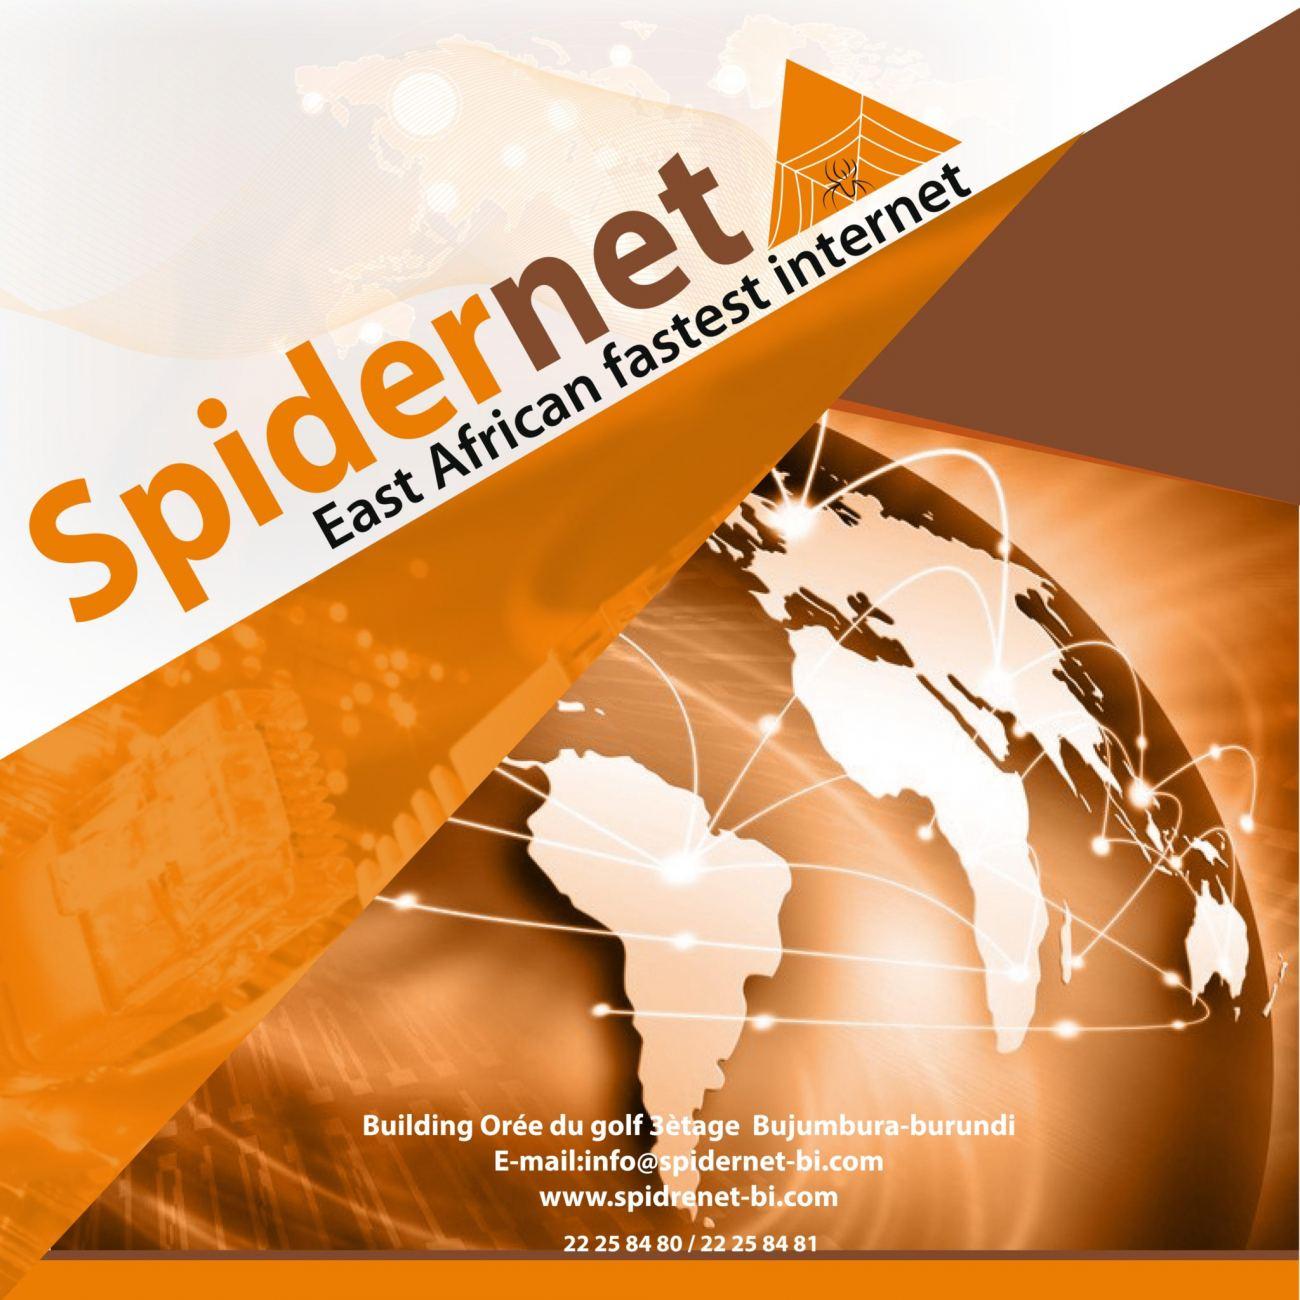 http://www.iwacu-burundi.org/wp-content/uploads/2017/02/PUB-SPIDERNET-22-FEV.jpg